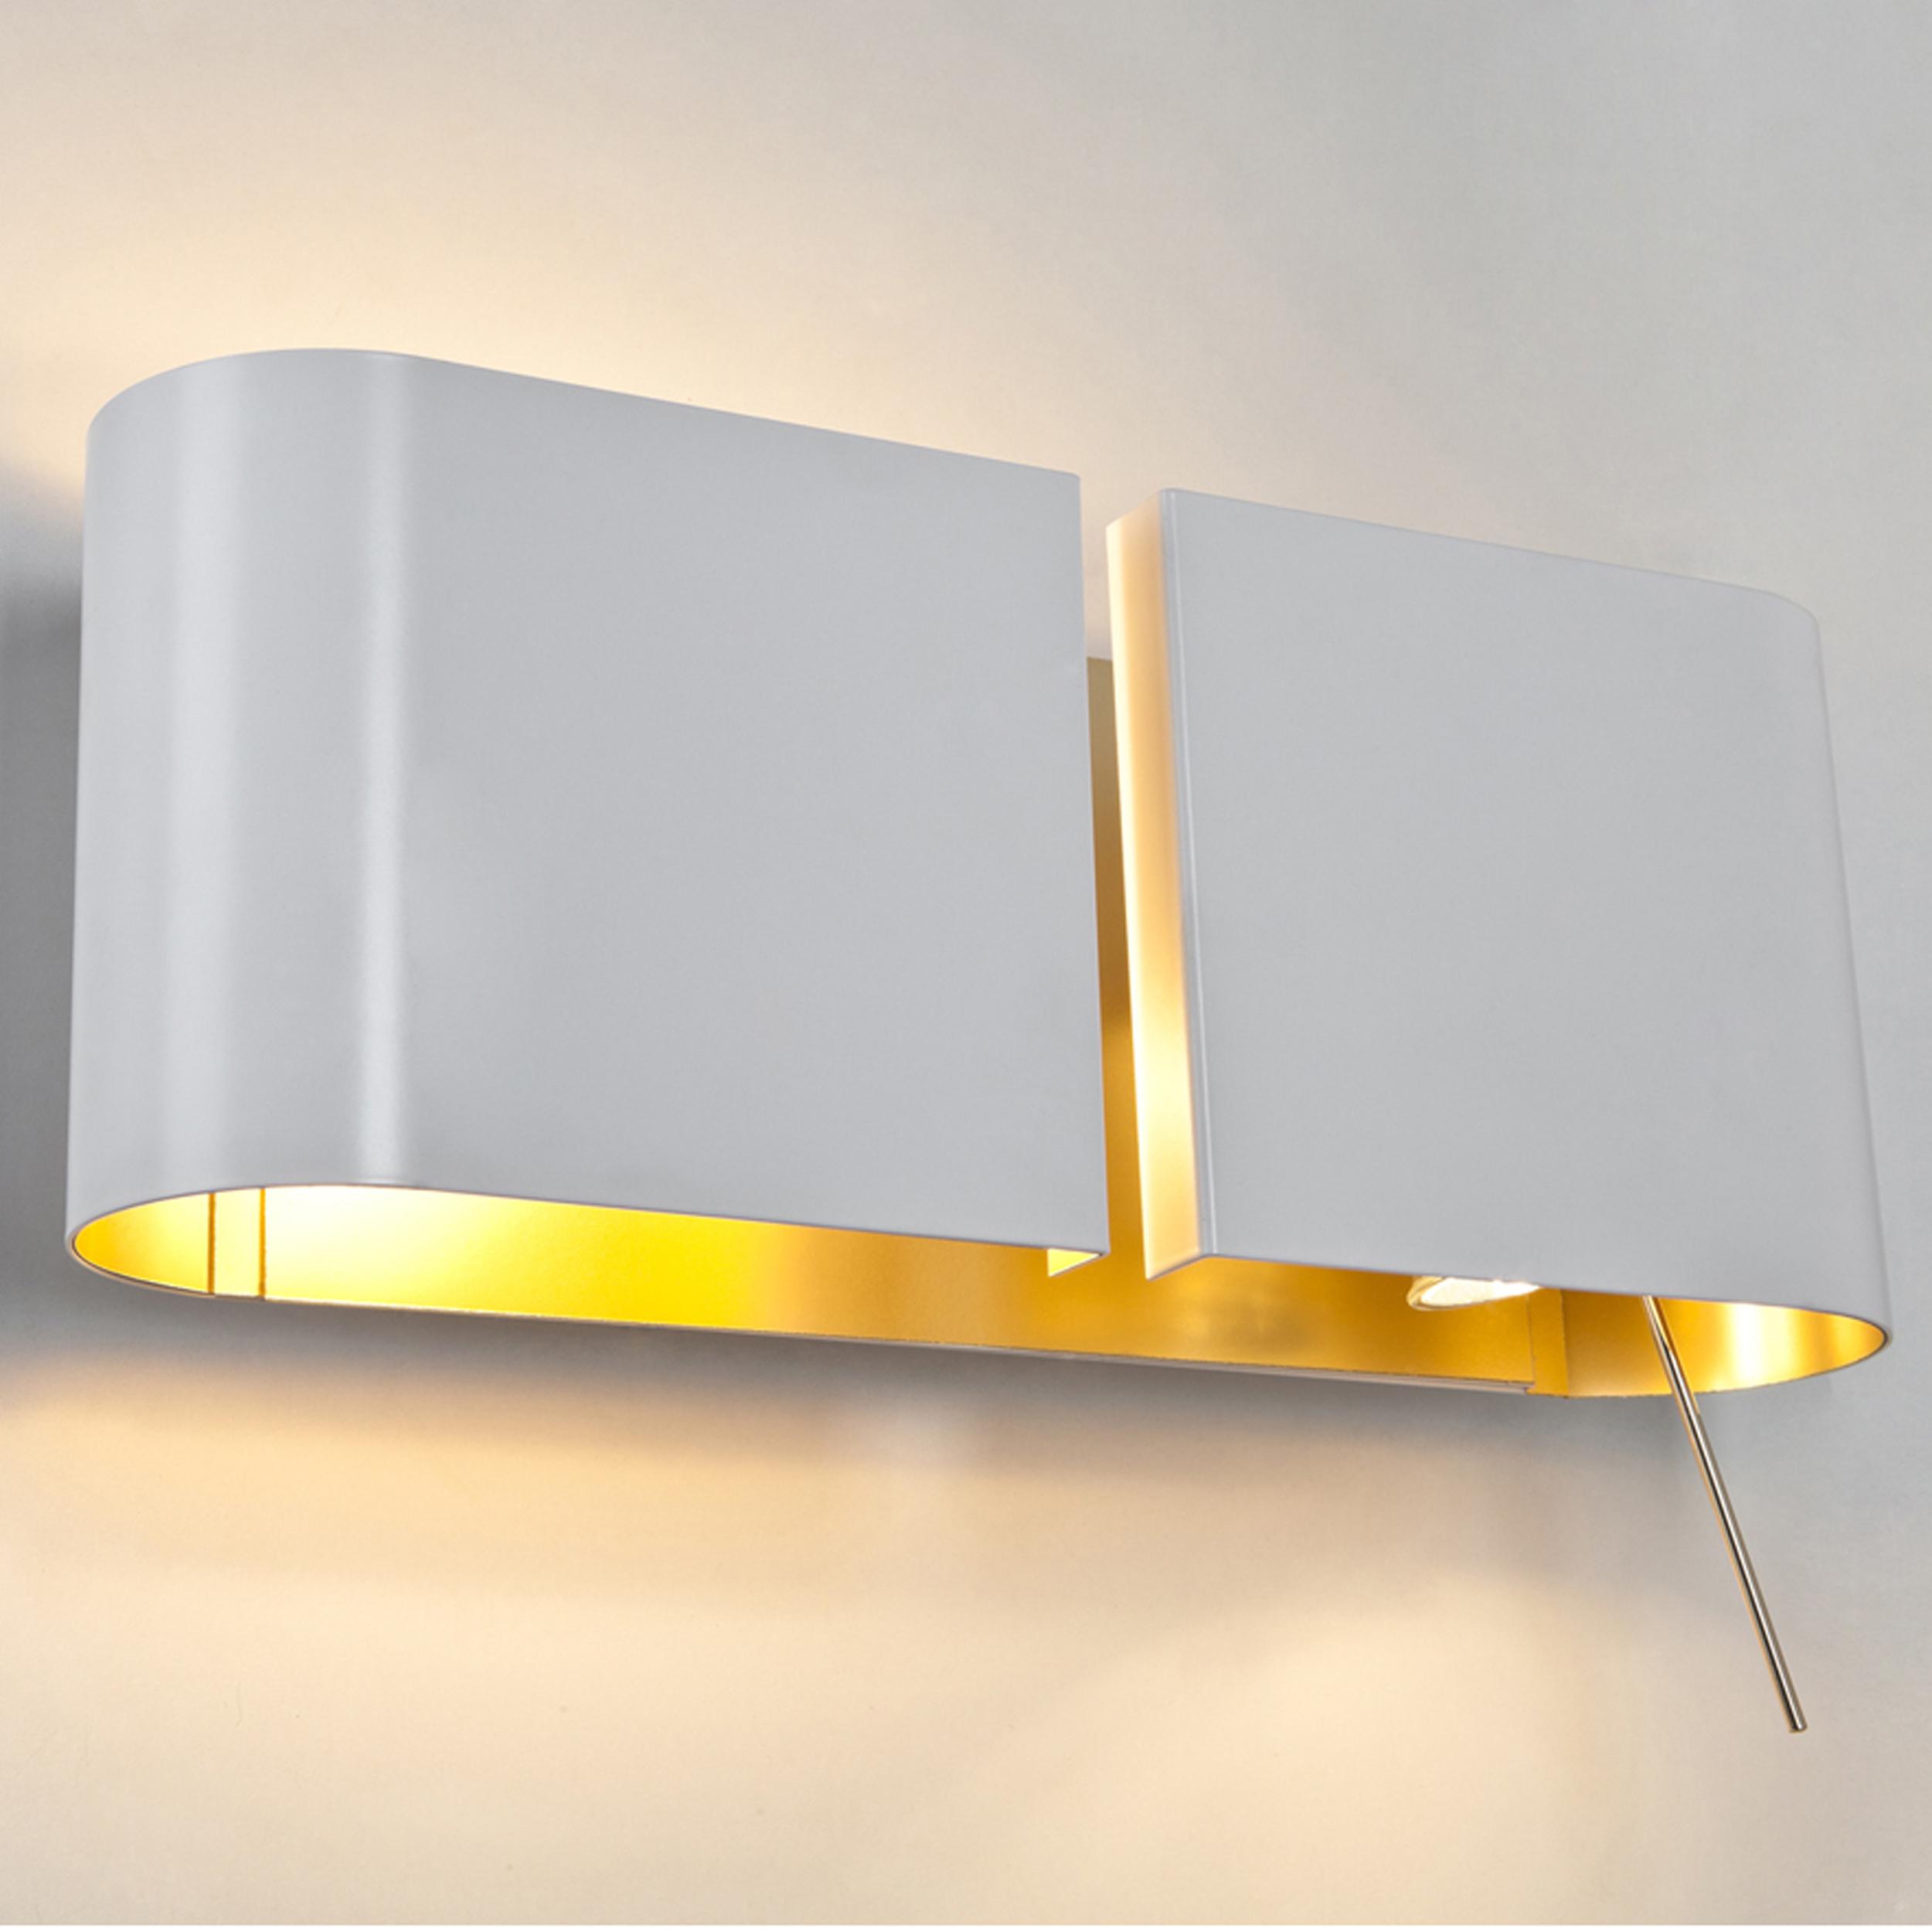 Contardi Duos Ap Wall Light White Gold B